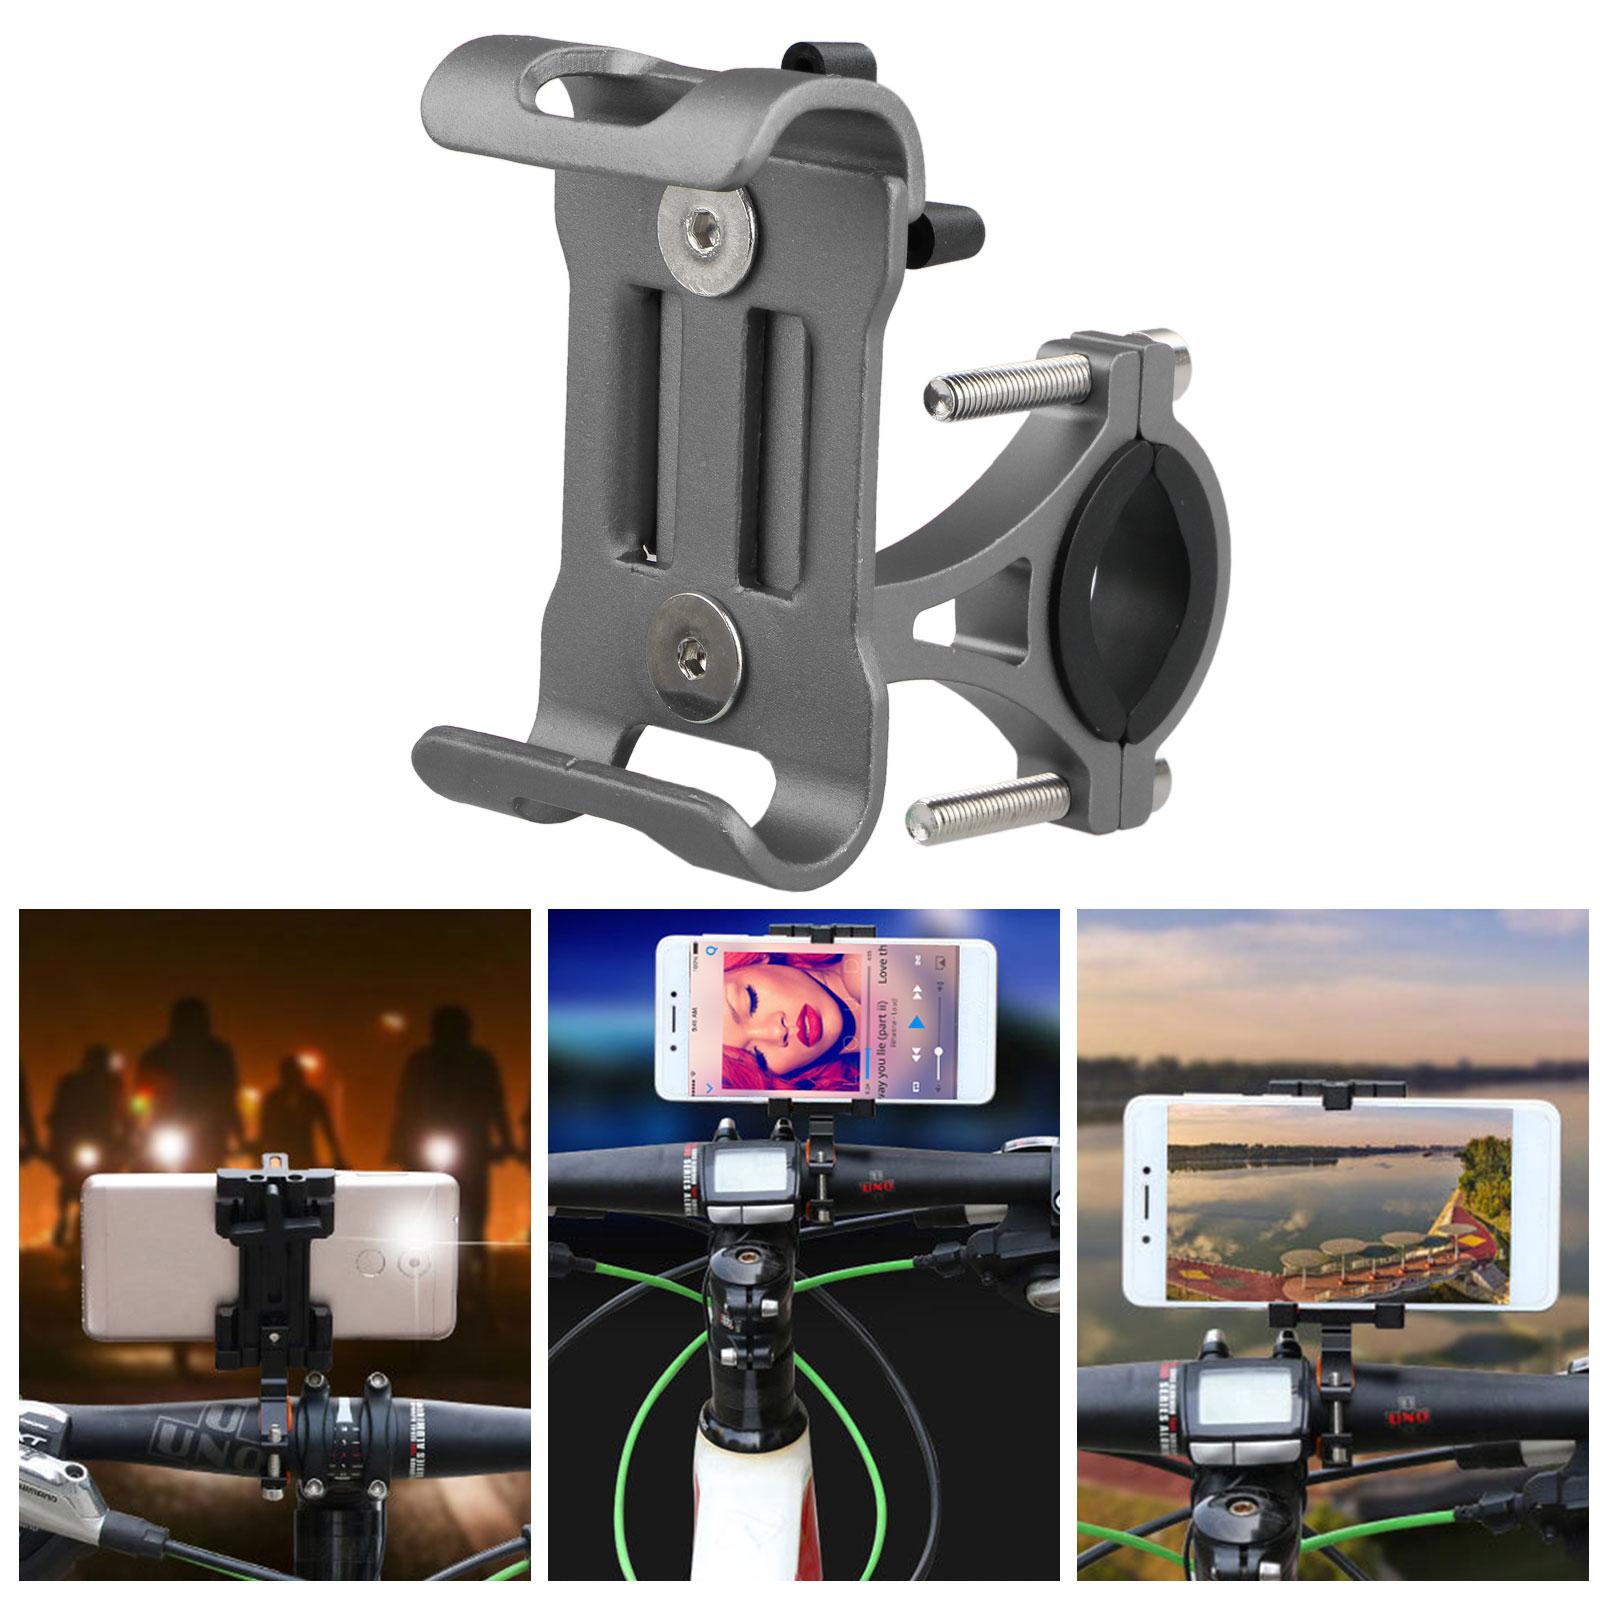 Aluminum-Motorcycle-Bike-Bicycle-Holder-Mount-MTB-Handlebar-For-Cell-Phone-GPS